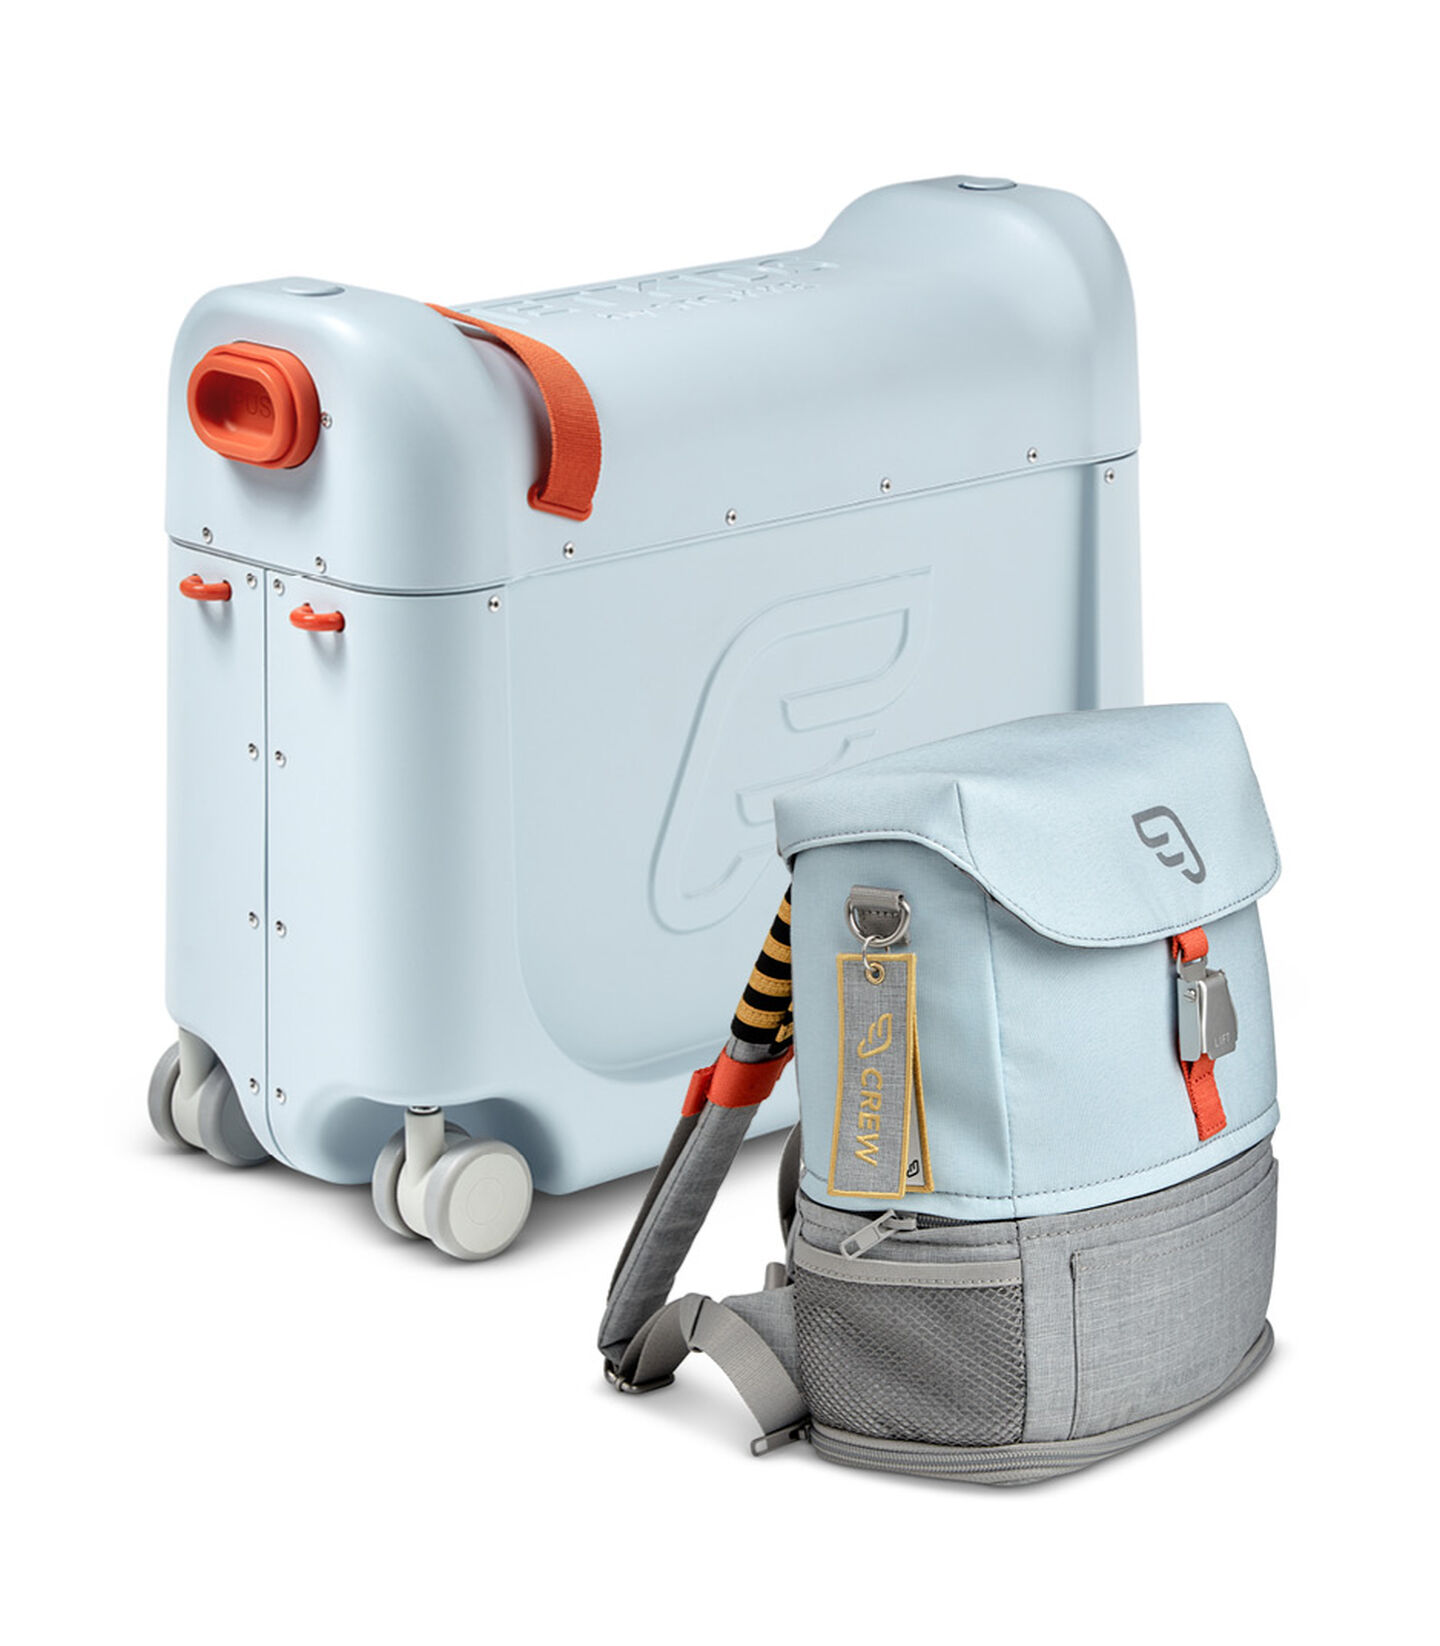 Комплект для путешествий BedBox™ + рюкзак пилота Crew BackPack™ Голубой/Голубой, Blue / Blue, mainview view 2